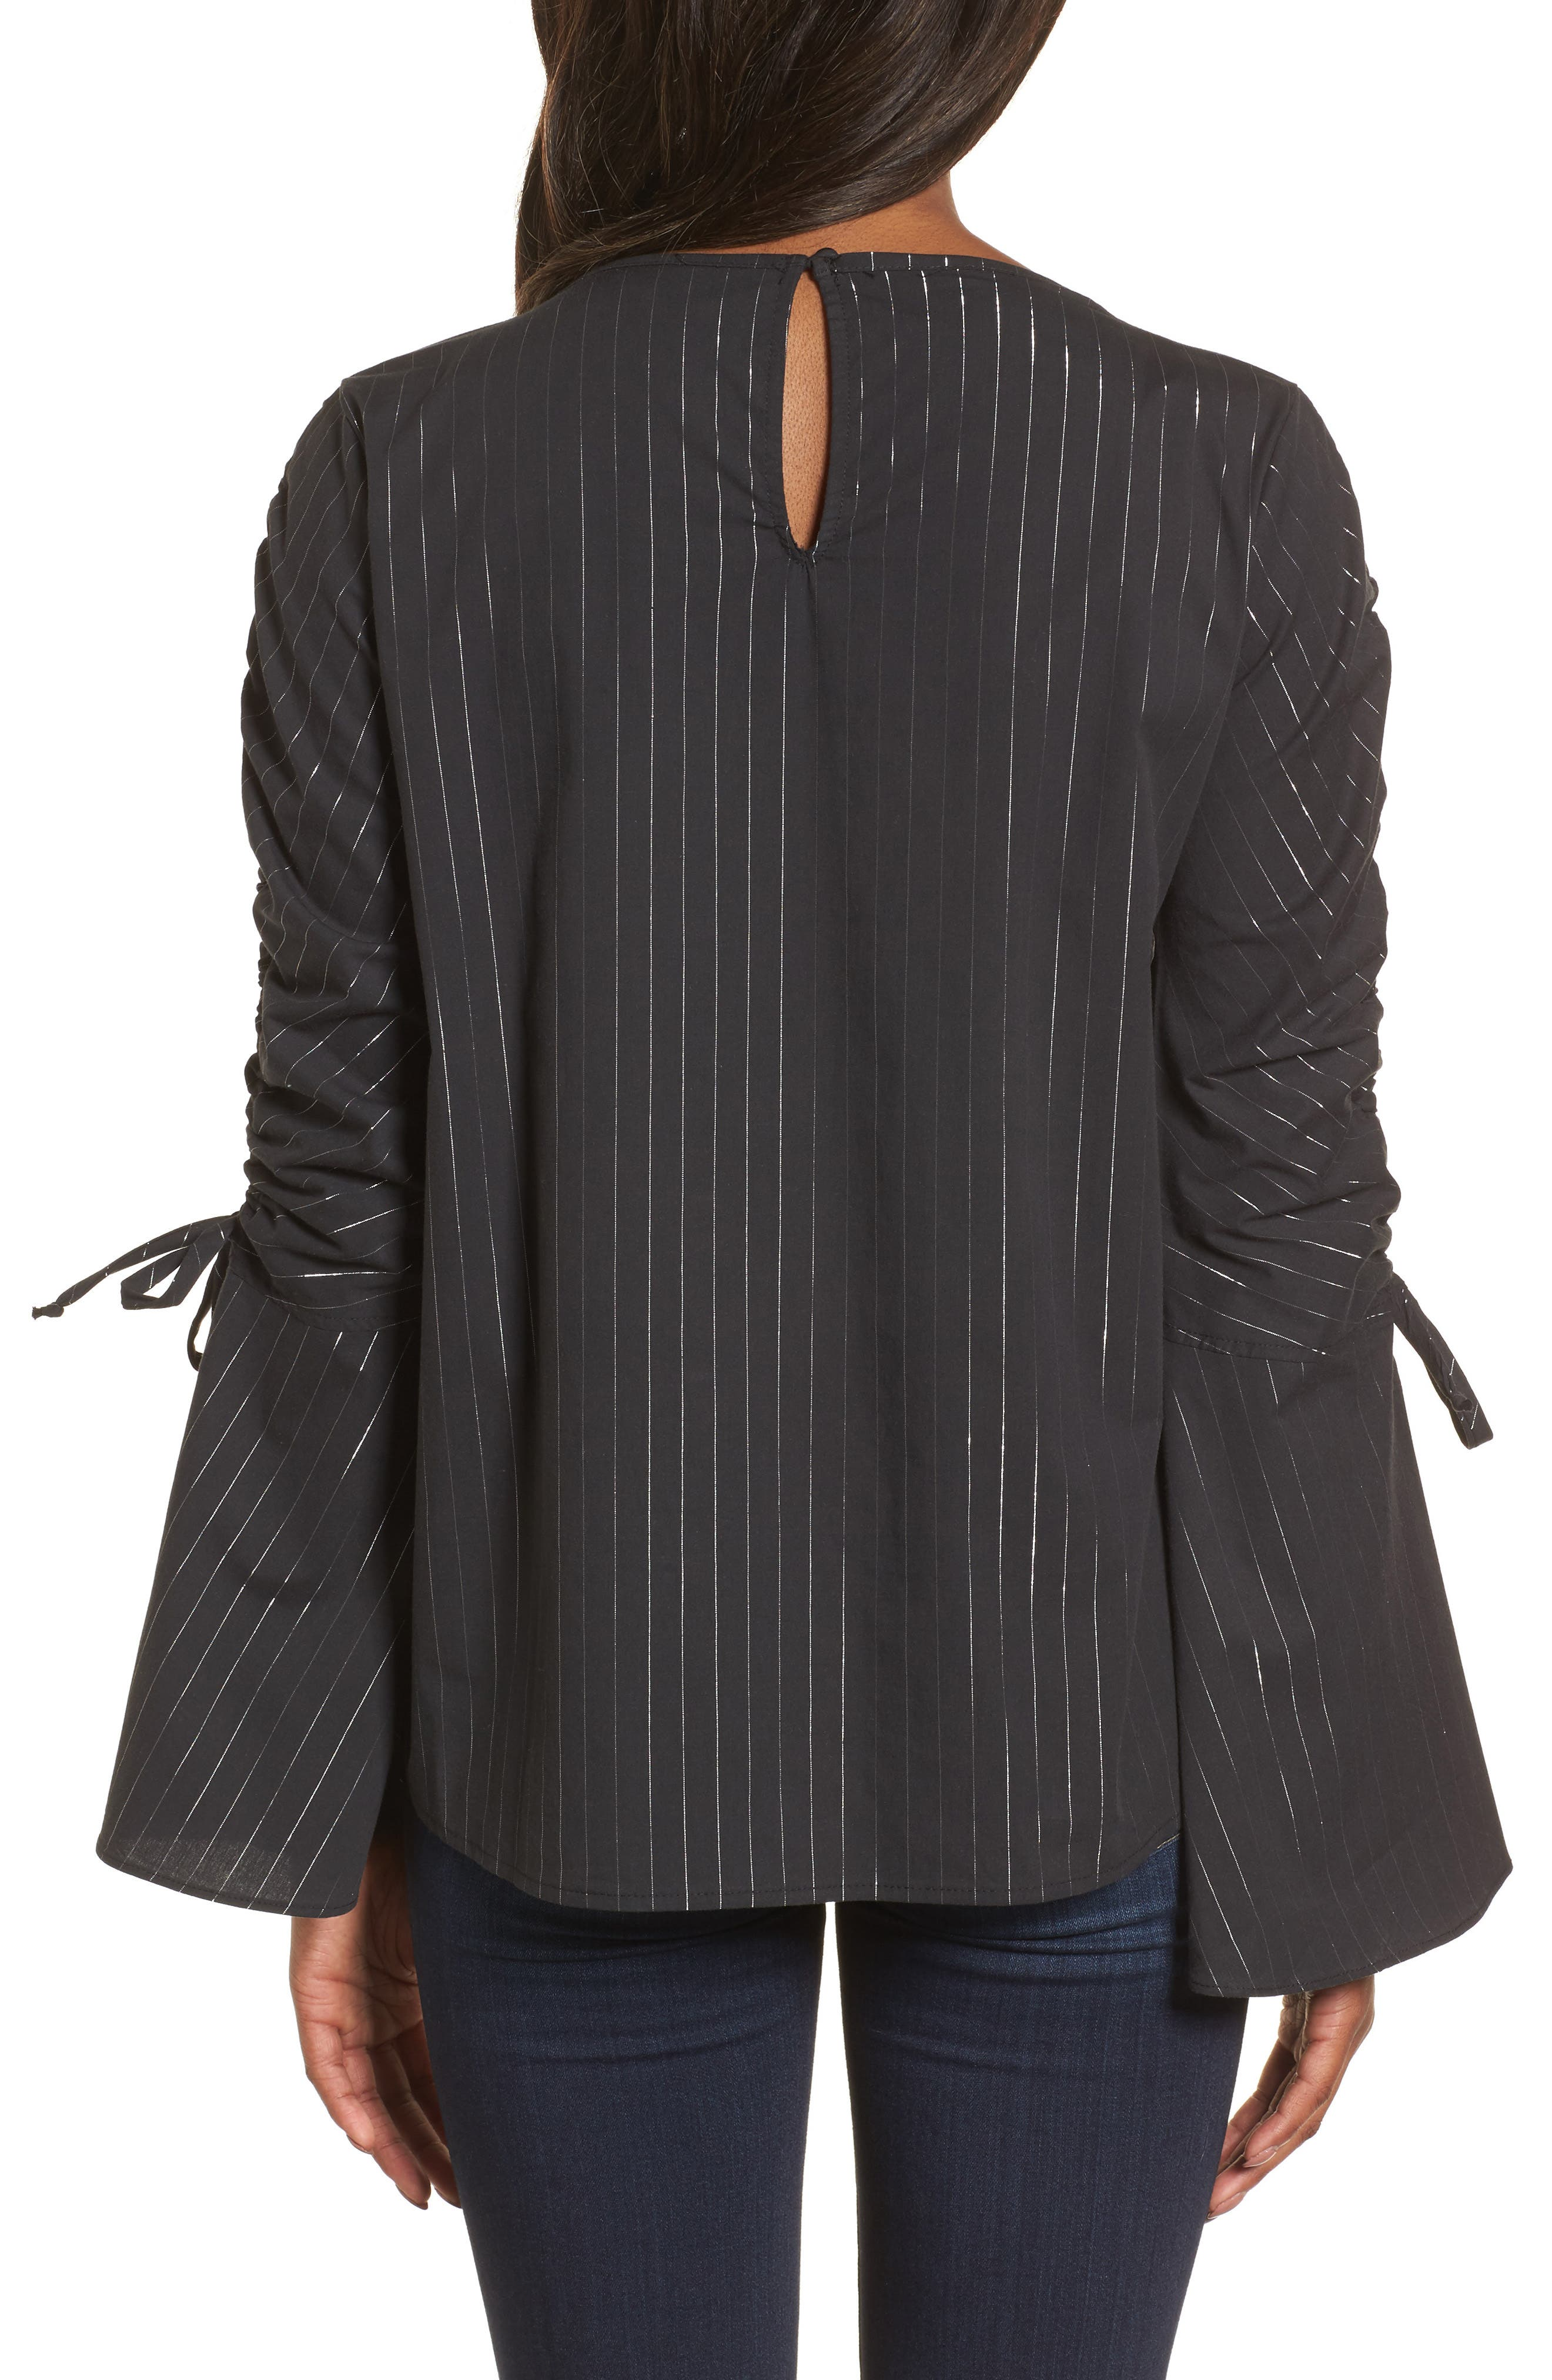 Ruched Sleeve Stripe Top,                             Alternate thumbnail 2, color,                             Black Wide Lurex Stripe